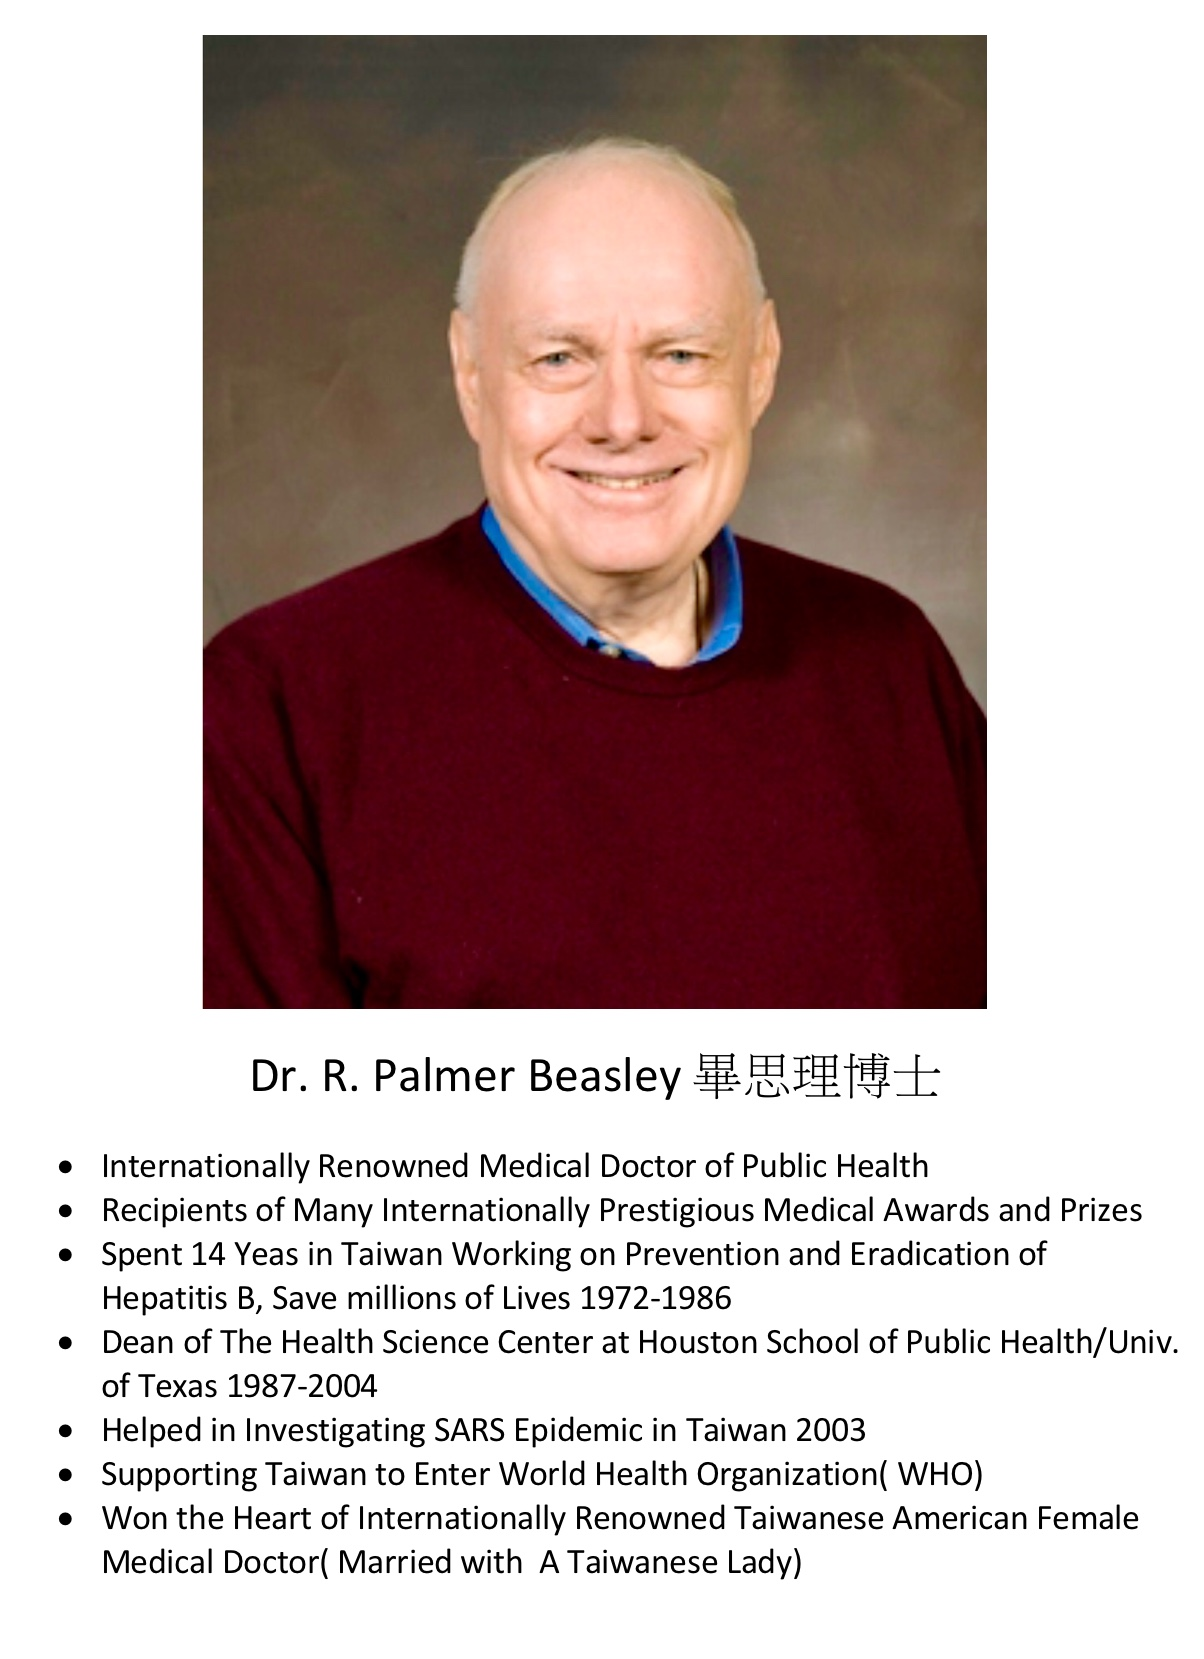 245. Dr. R. Palmer Beasley 畢思理博士